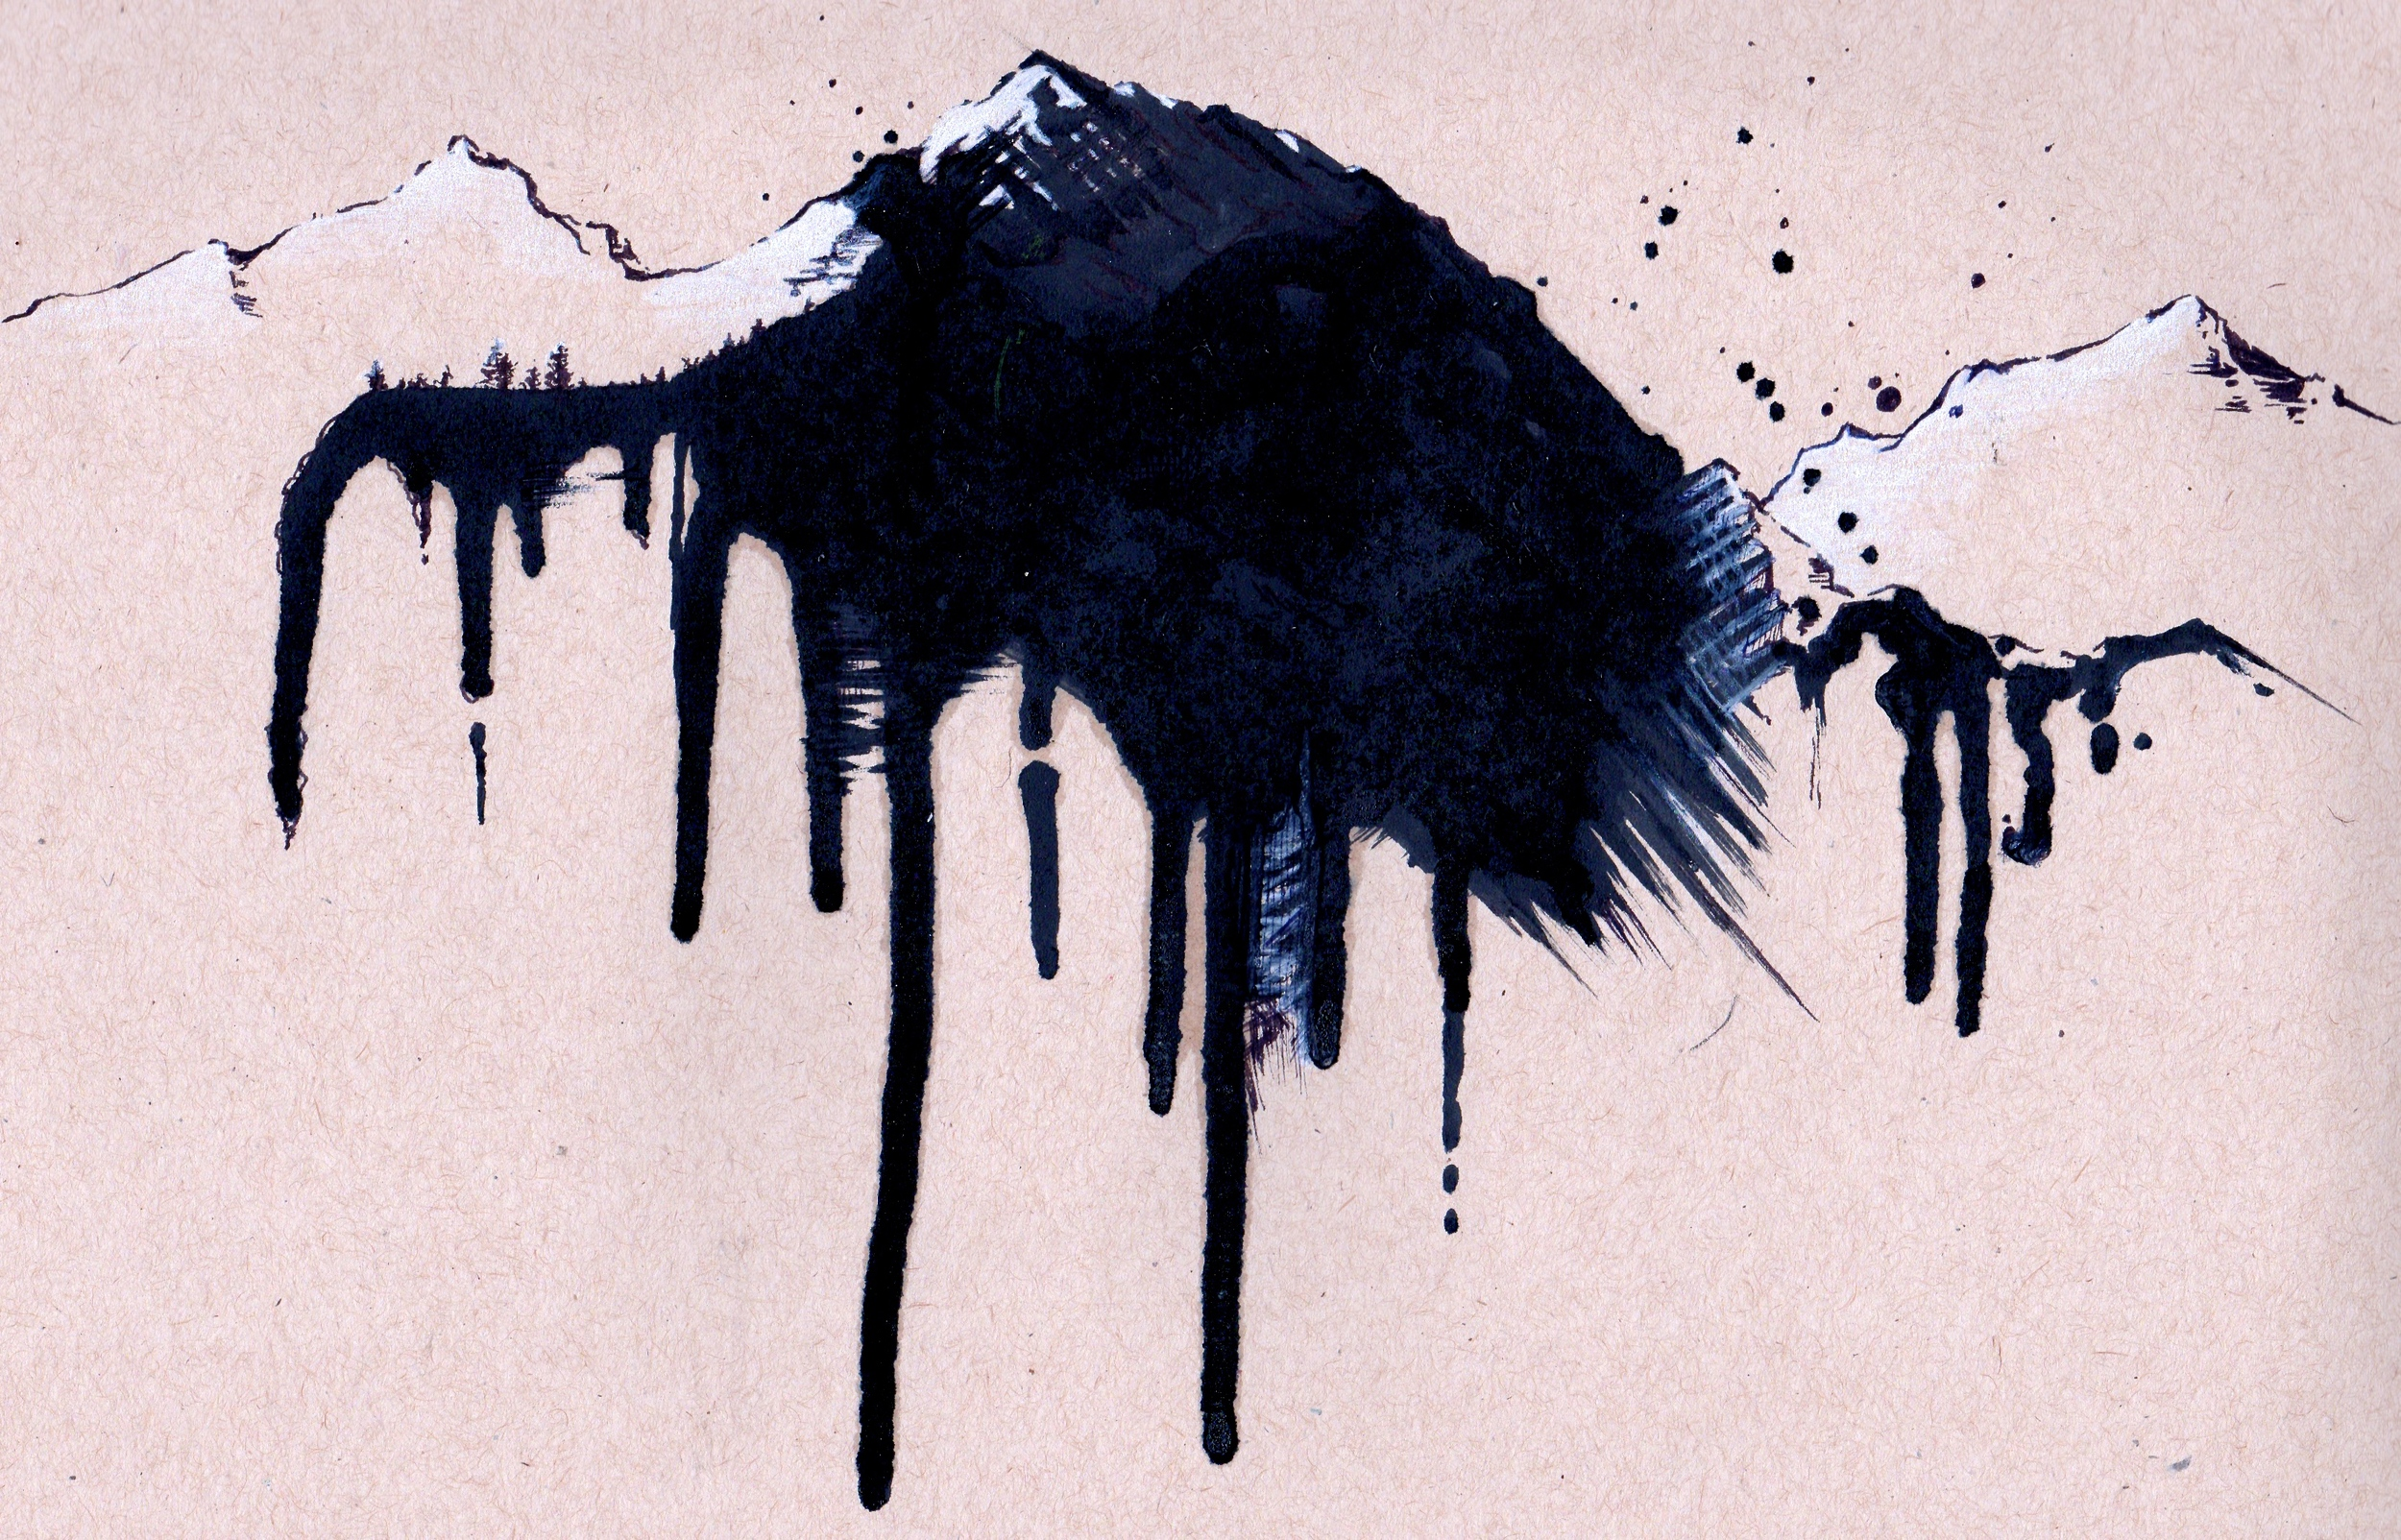 - Glacier Mountains arm band tattoo-